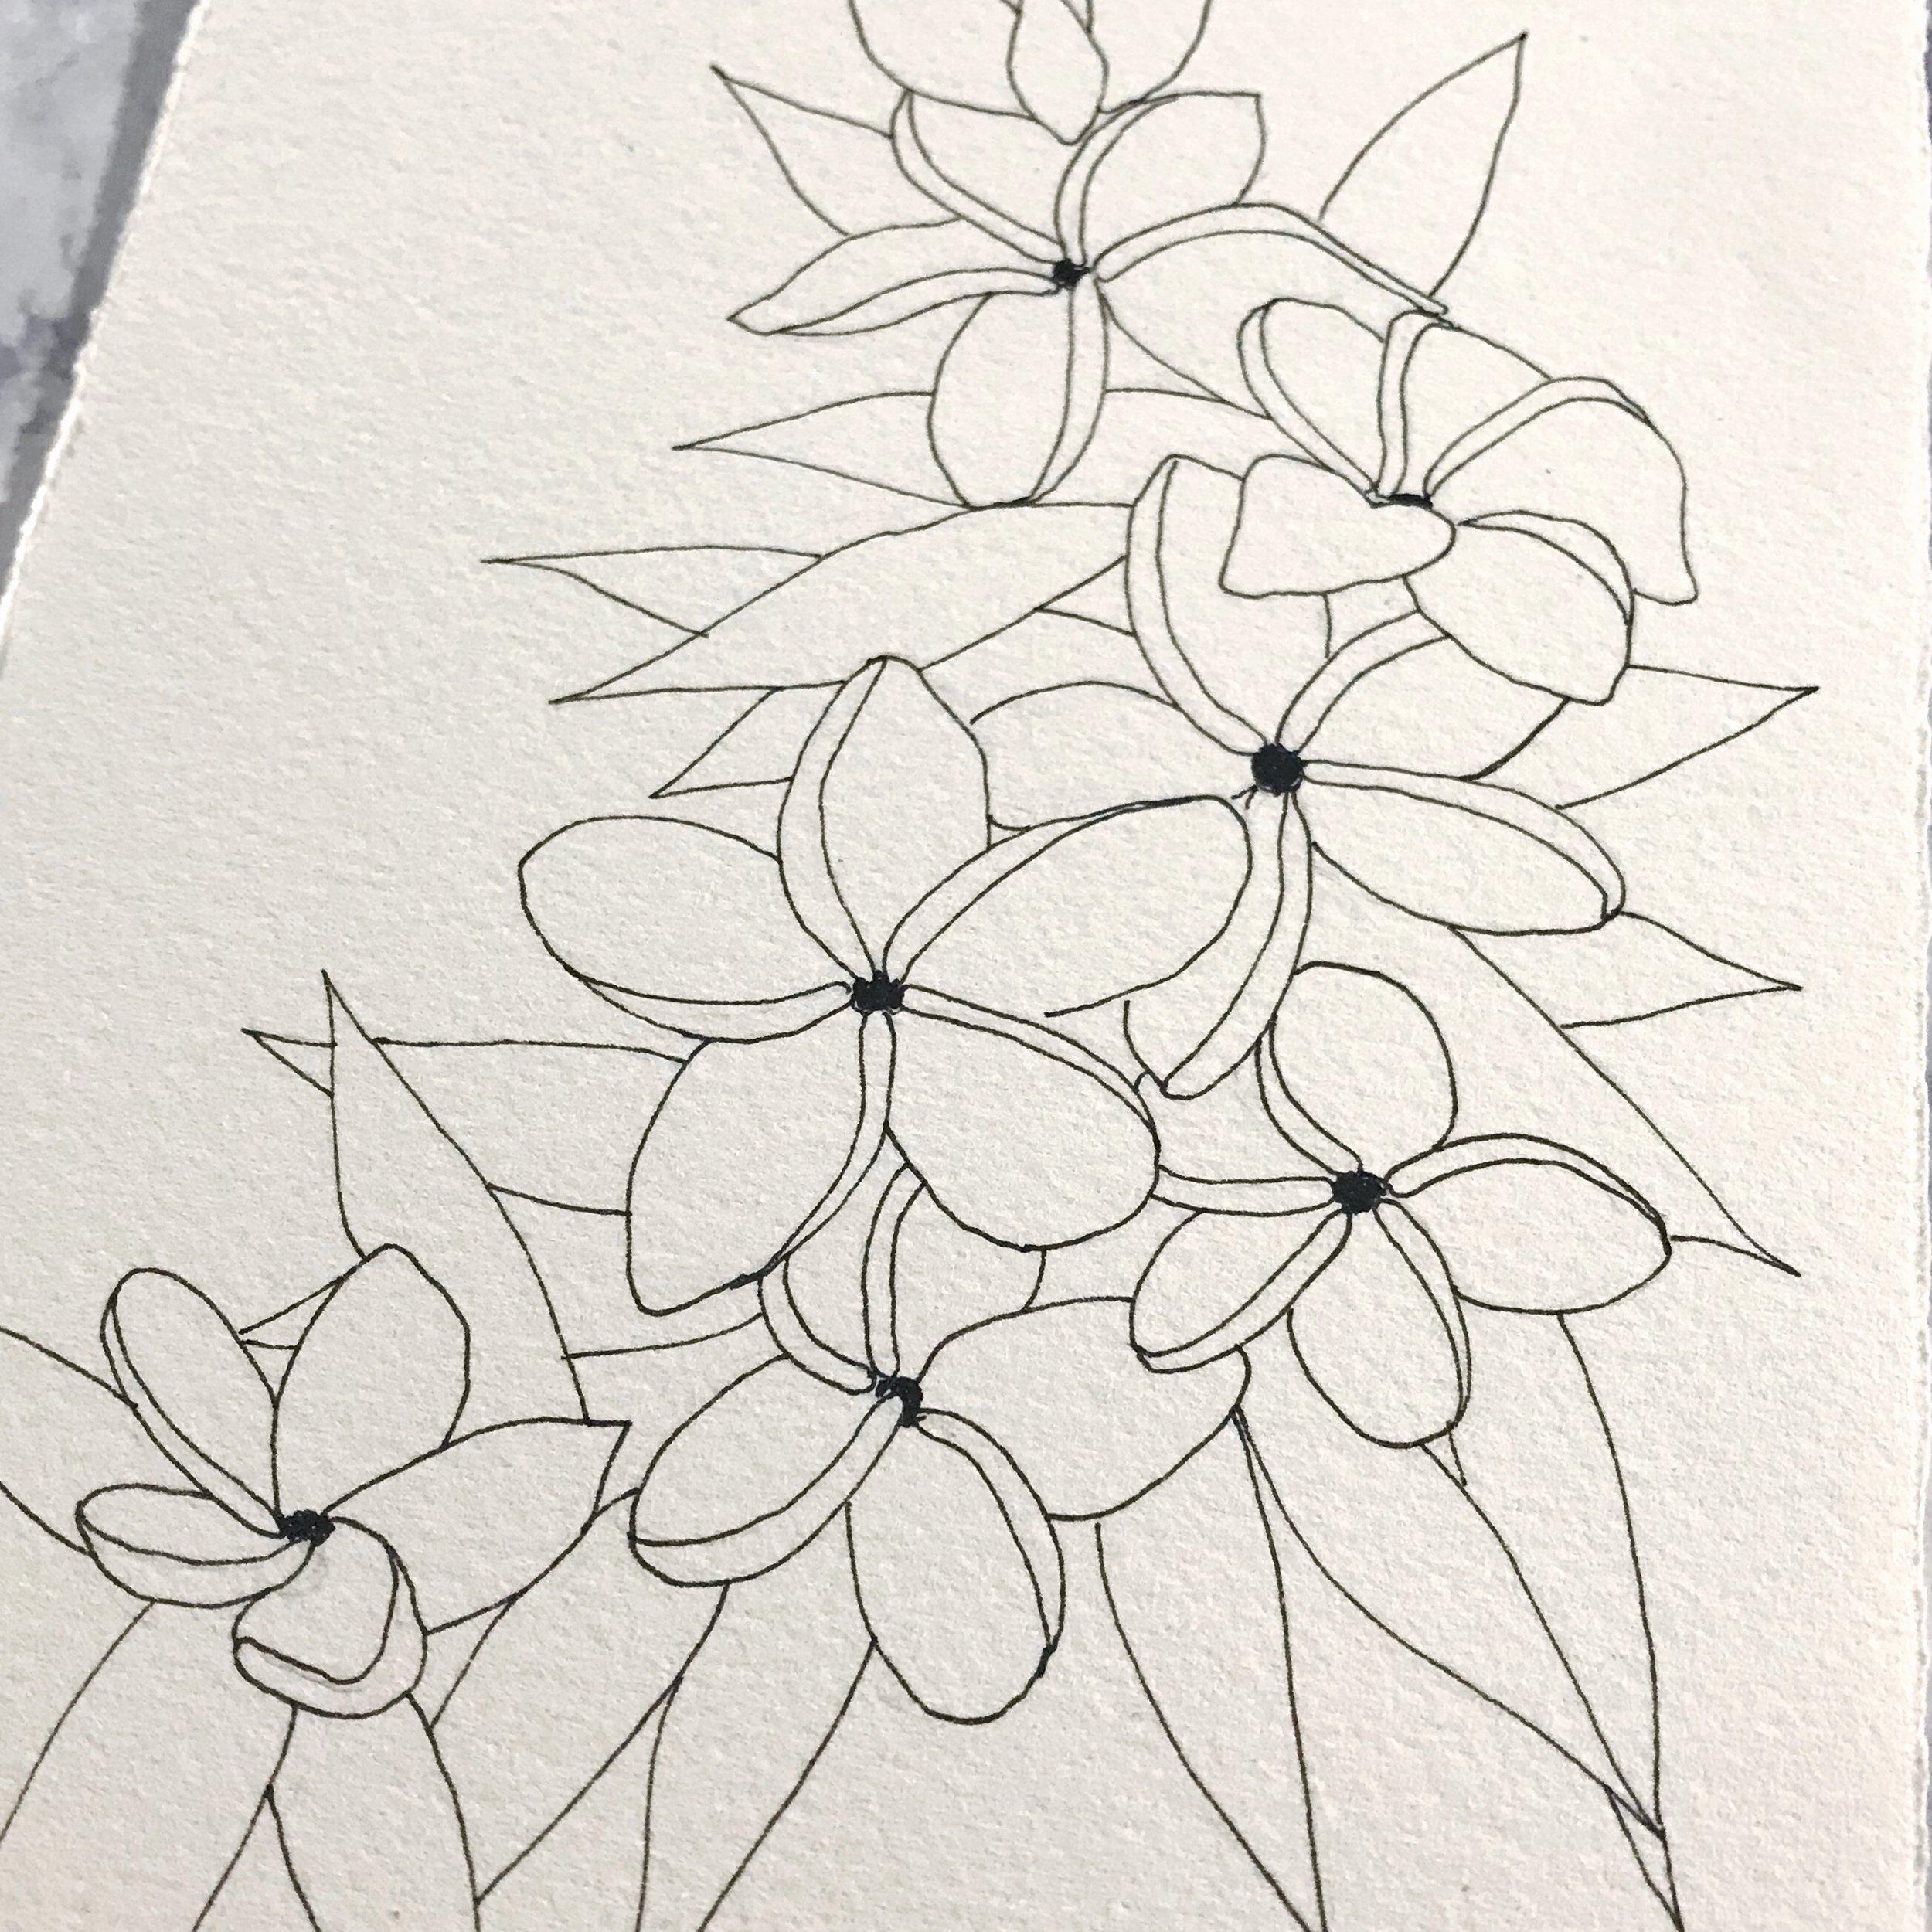 Plumeria flowers drawn on Arches Cold Press paper, by danielleandco.com